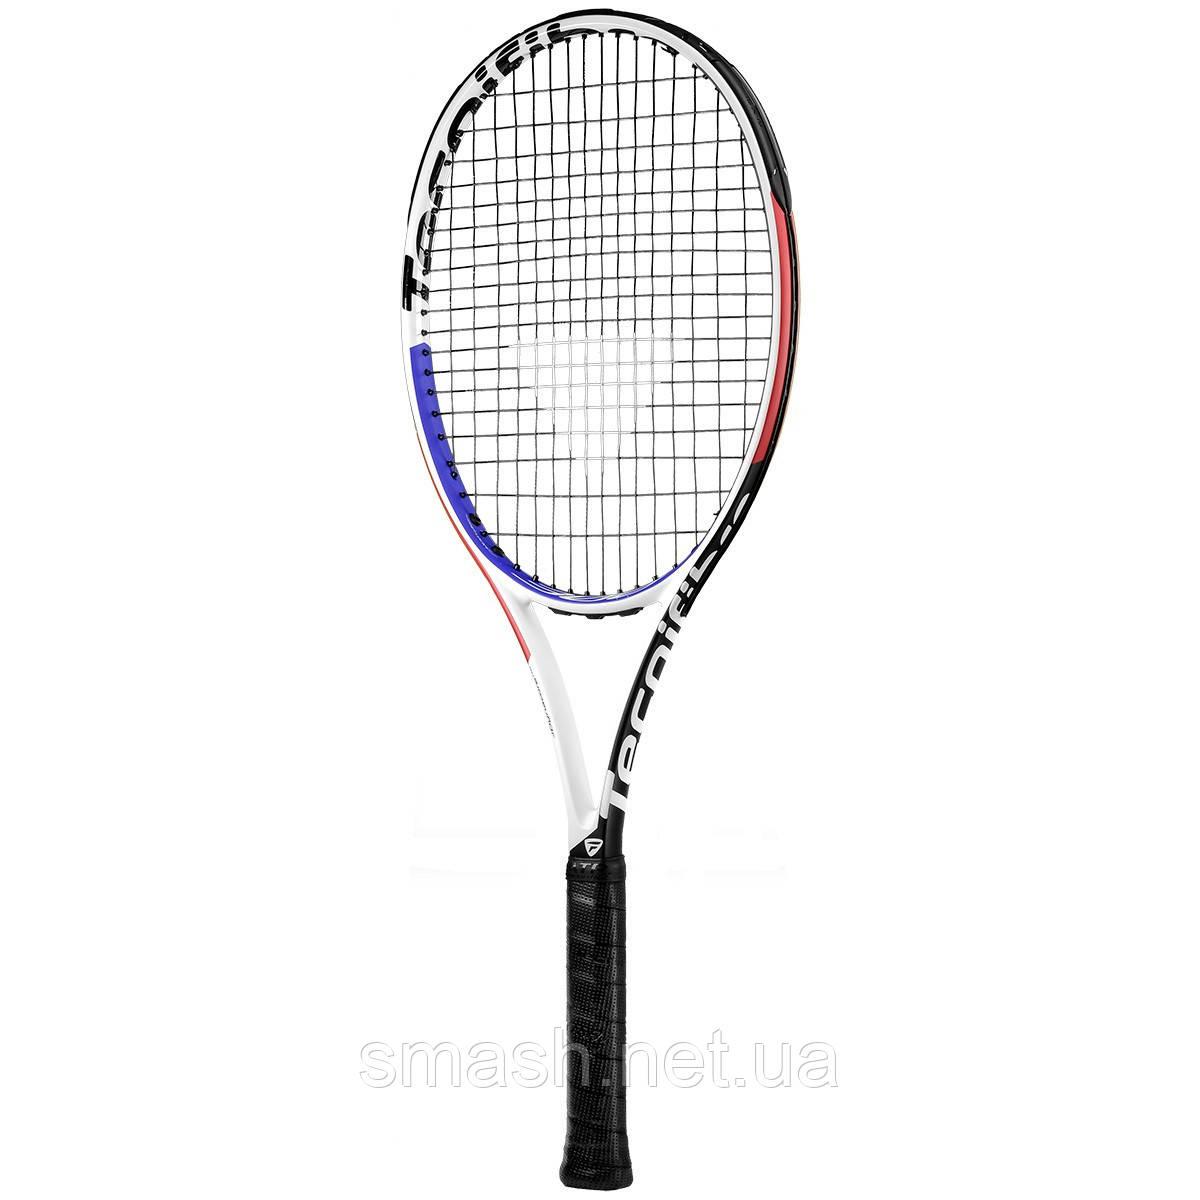 Теннисная ракетка Tecnifibre TFIGHT 300 XTC ATP